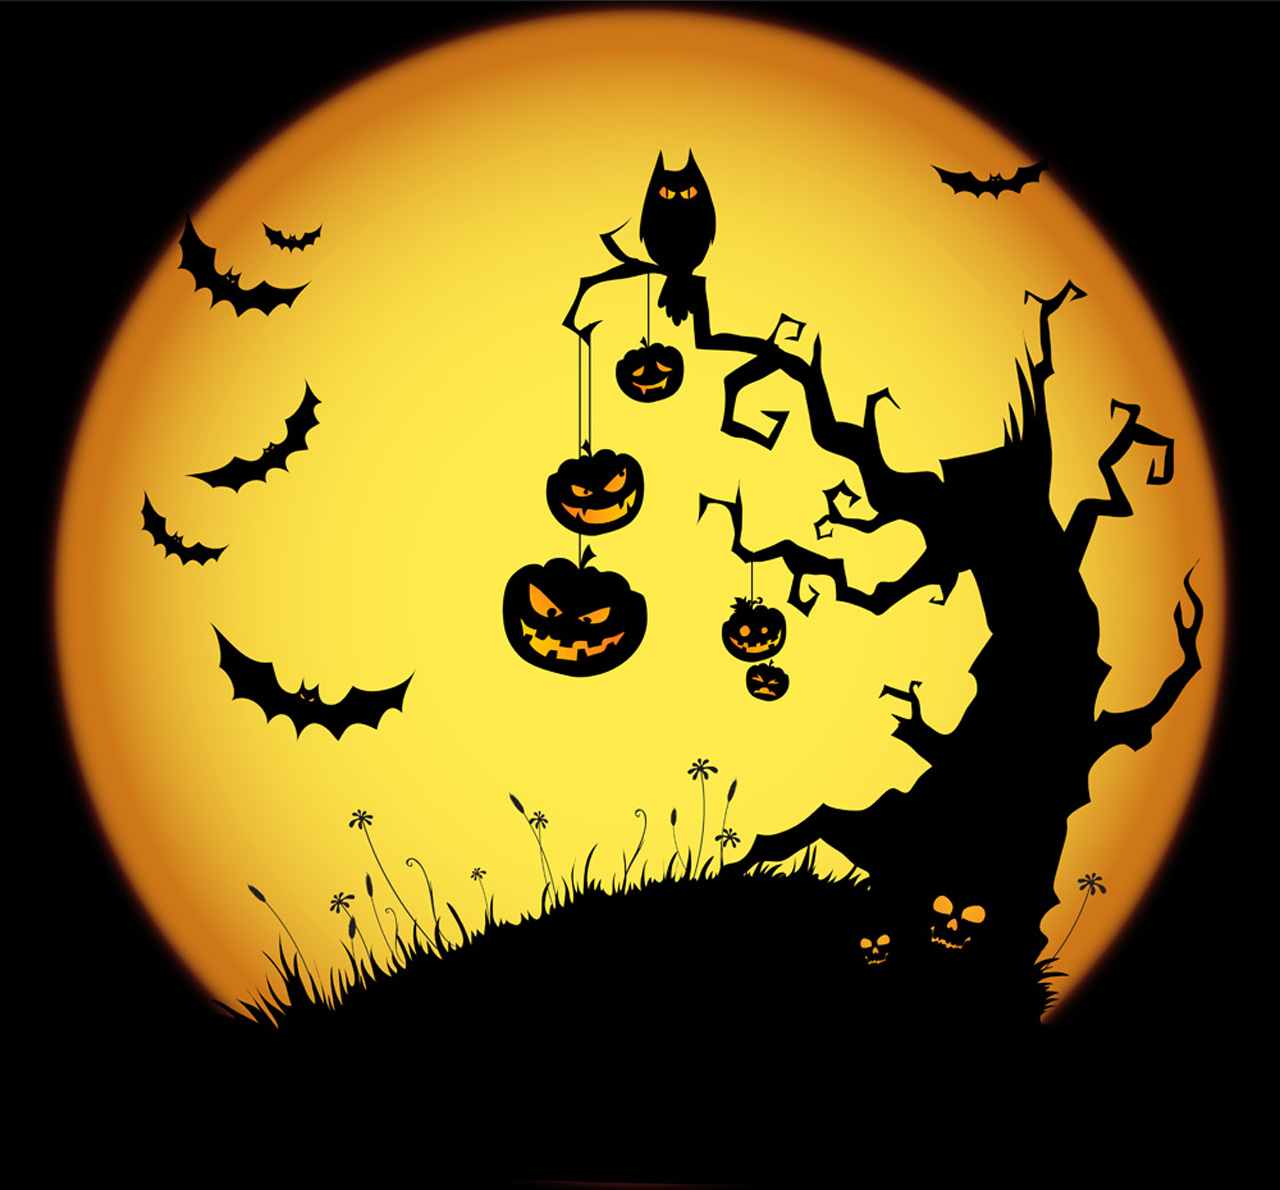 Halloween-Theme-Wallpaper